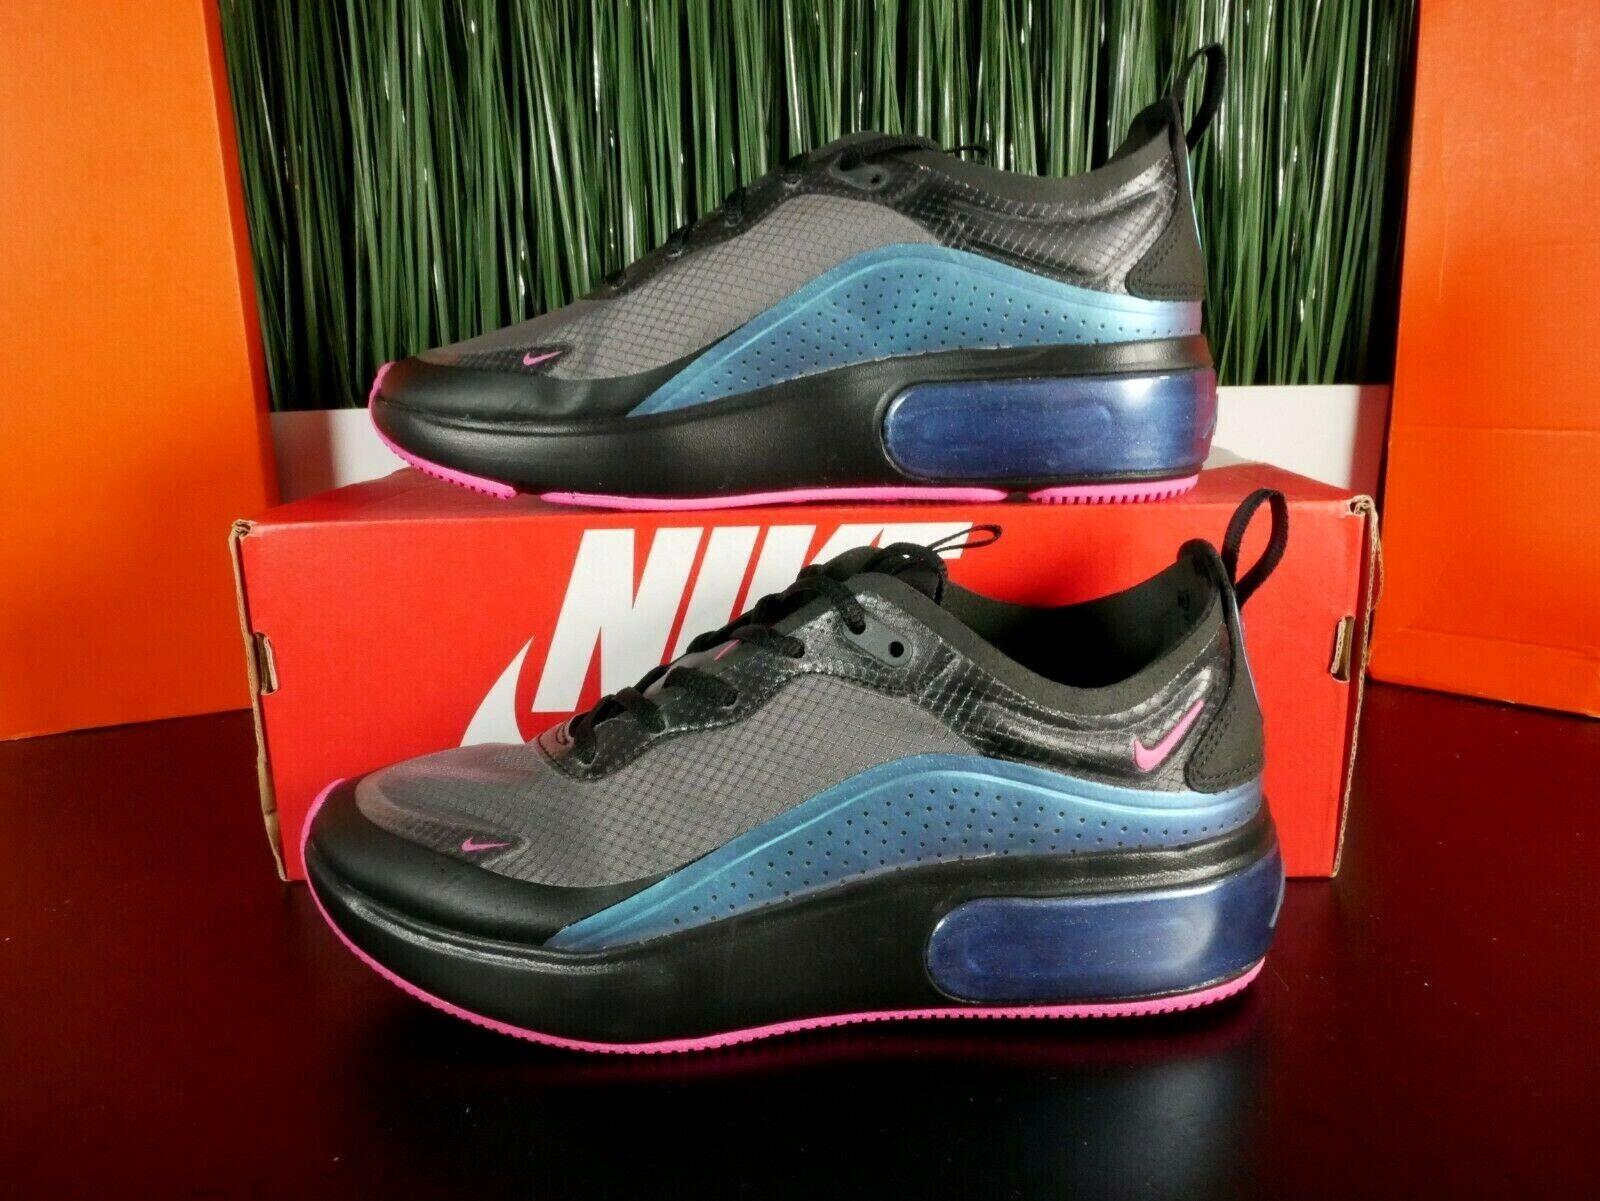 Nike Air Max Dia SE Womens Running Shoes Black Laser Fuchsia AR7410 001 Size 6 8